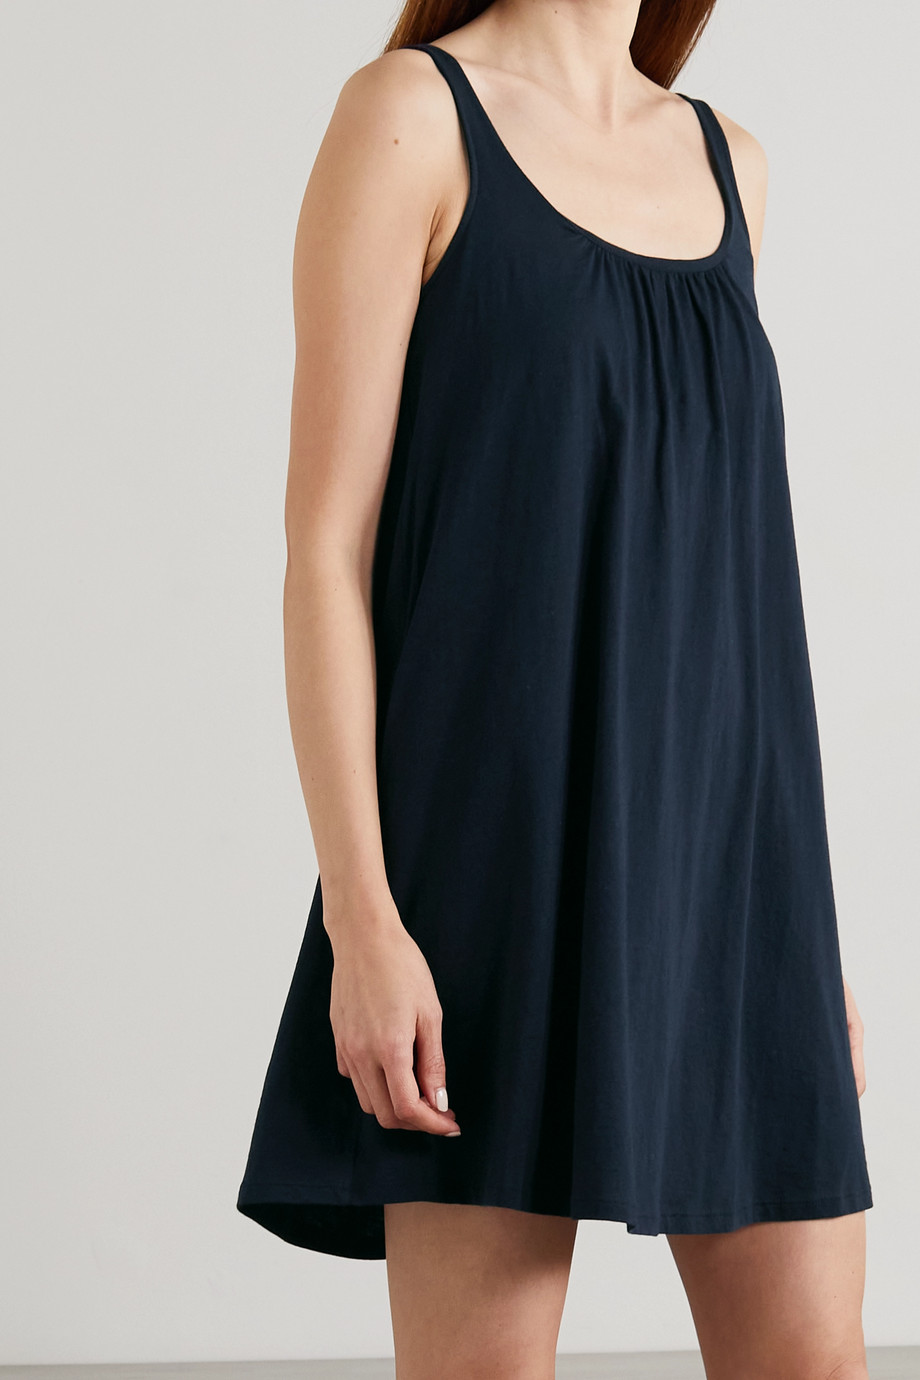 Skin + NET SUSTAIN Karla Nachthemd aus Bio-Pima-Baumwoll-Jersey